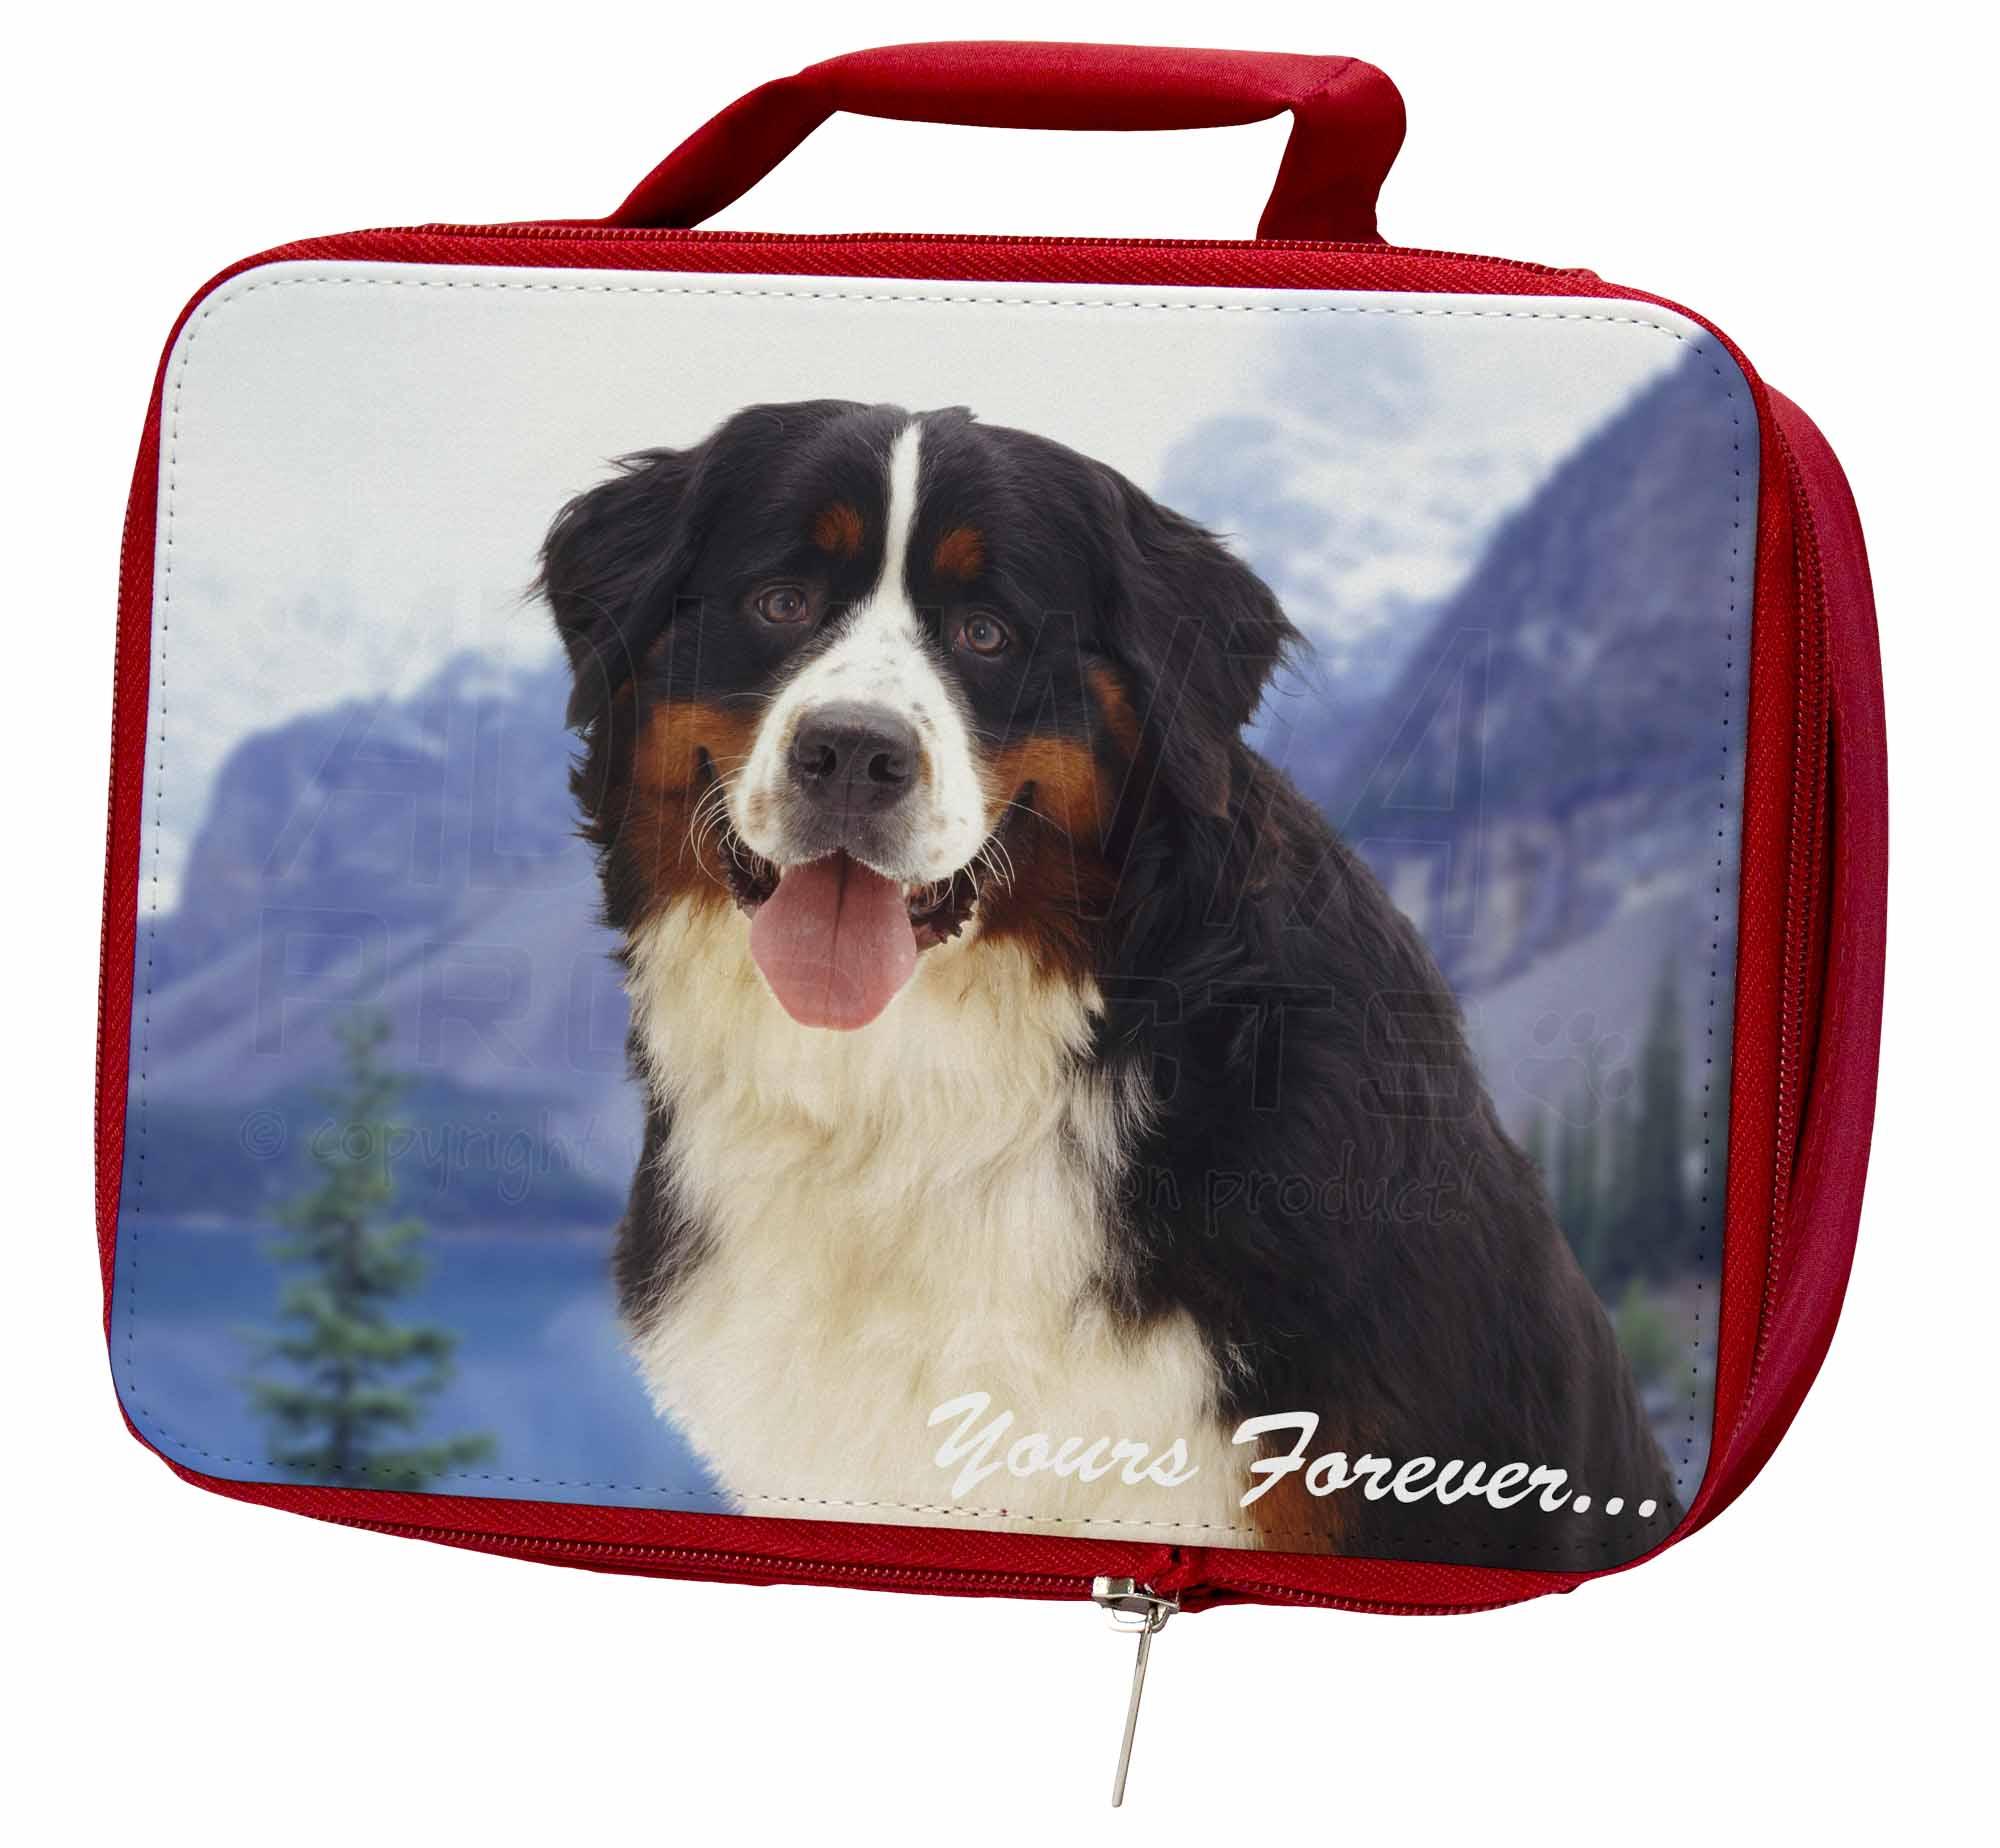 Bernese Mountain Dog Insulated Red School Bag, Lunch Box/Picnic Bag, School AD-BER6yLBR a661b7